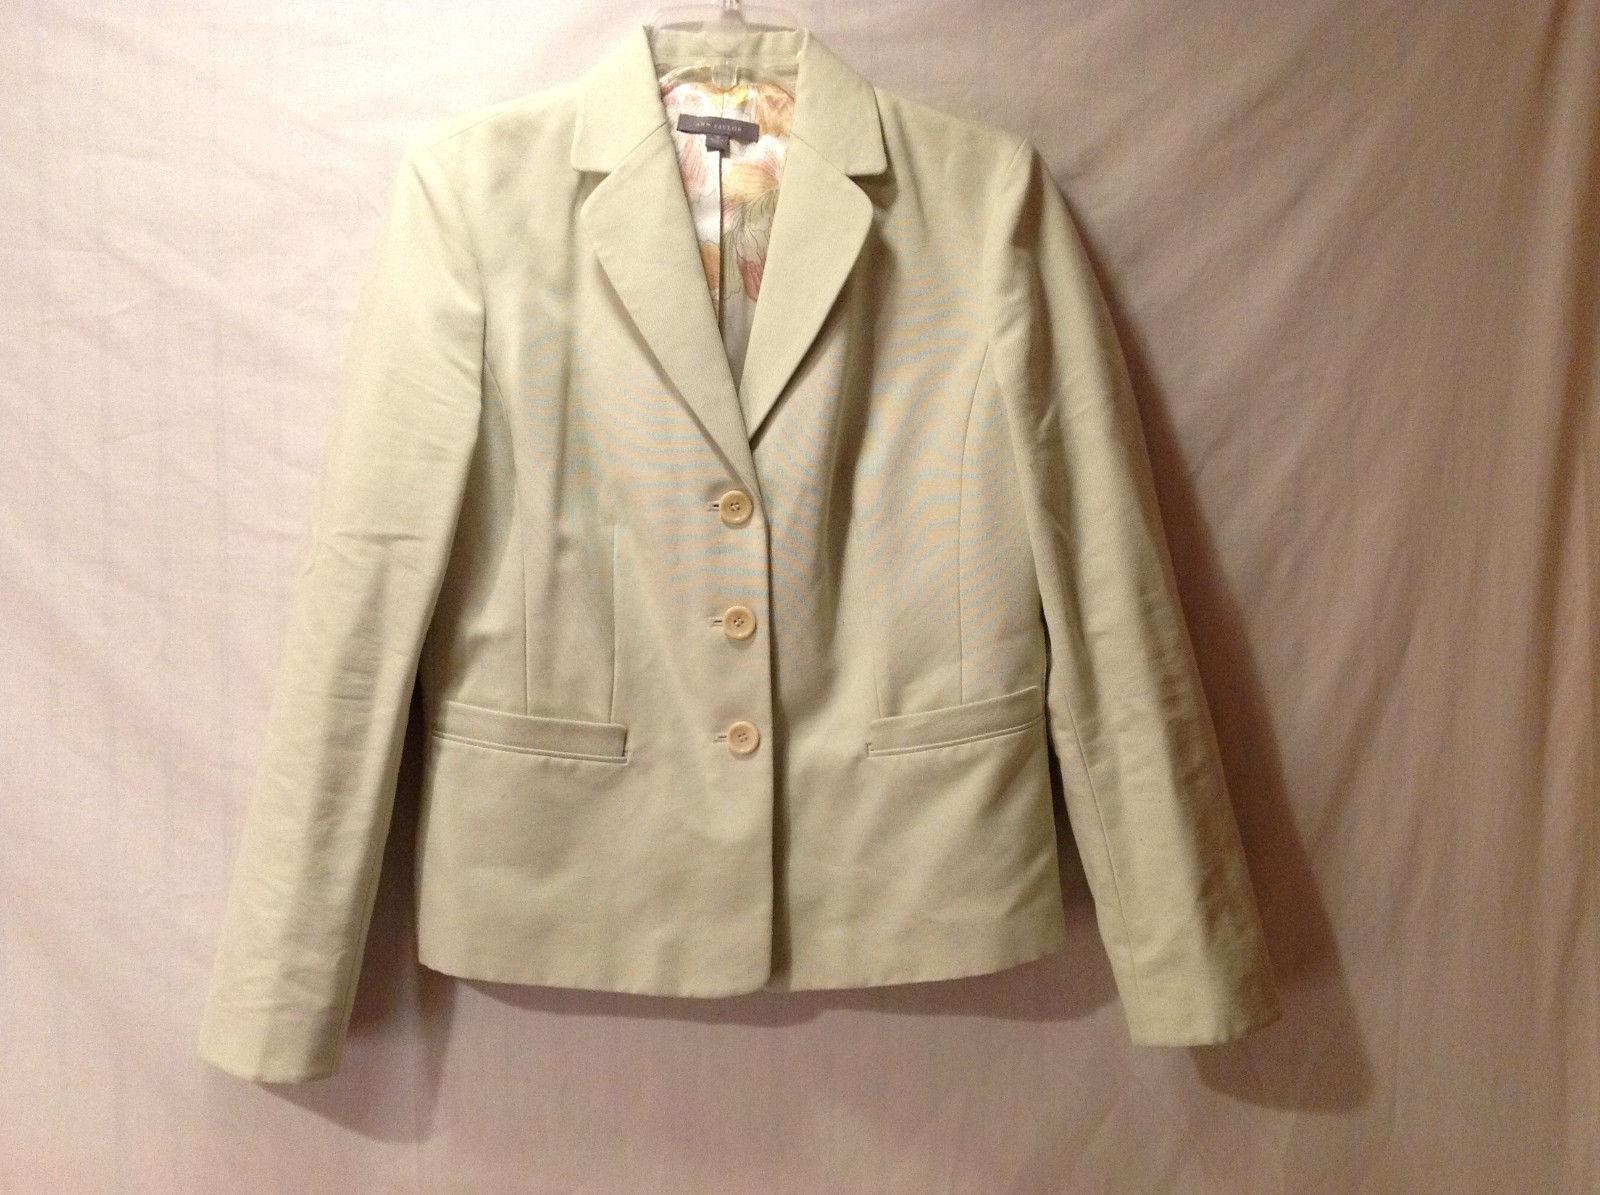 Ann Taylor Womens Size 10 Short Blazer Light Pastel Green Notched Lapel & Collar